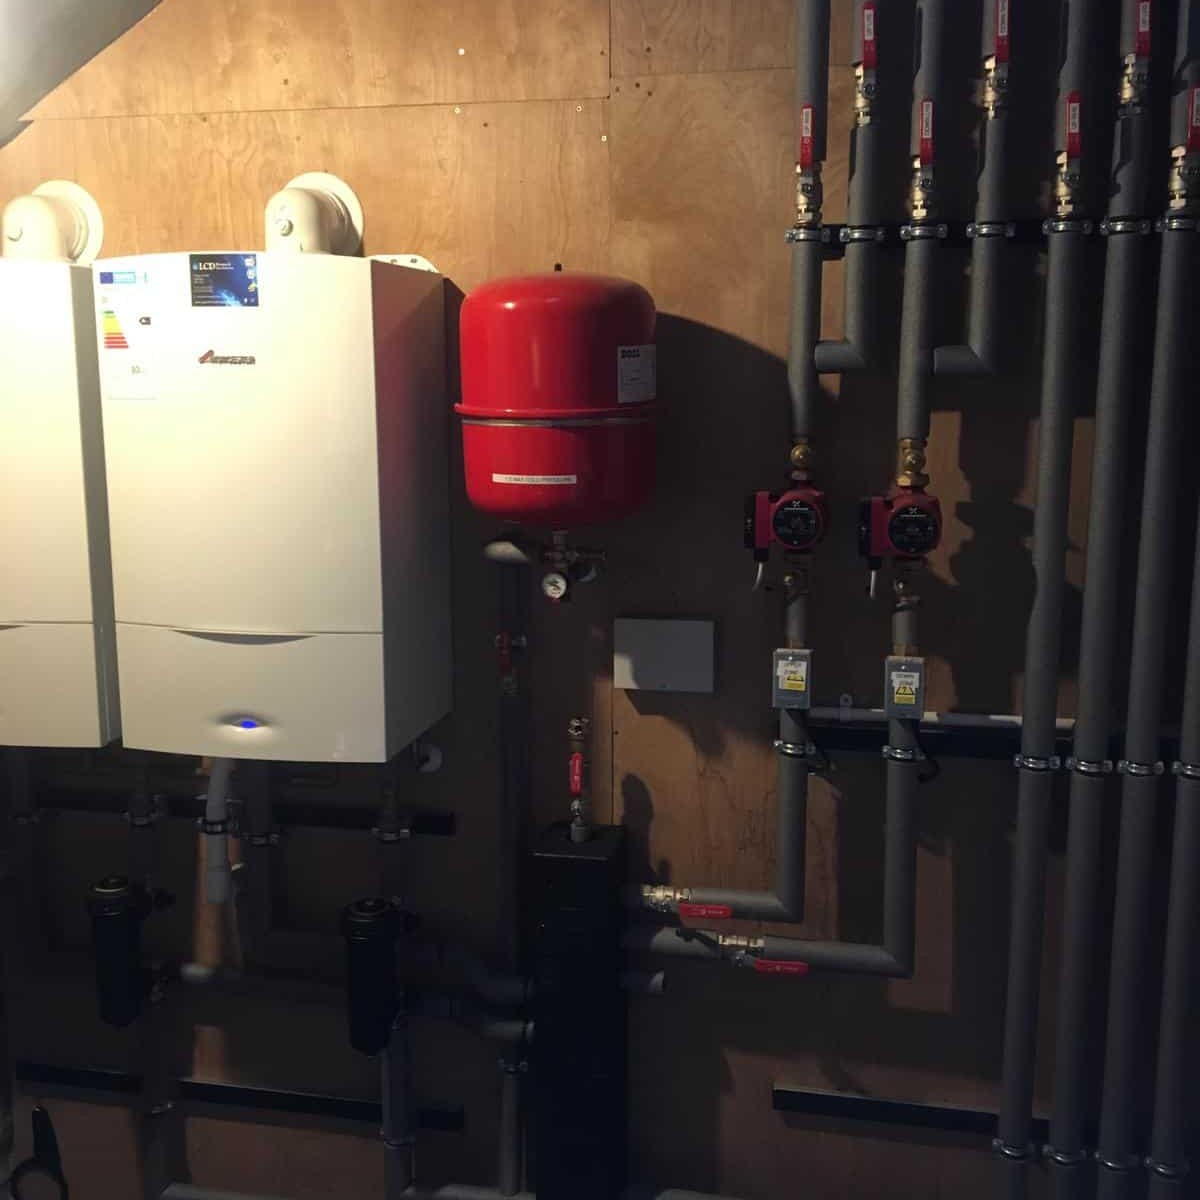 Photos from Bishopton Parish Church heating system 30